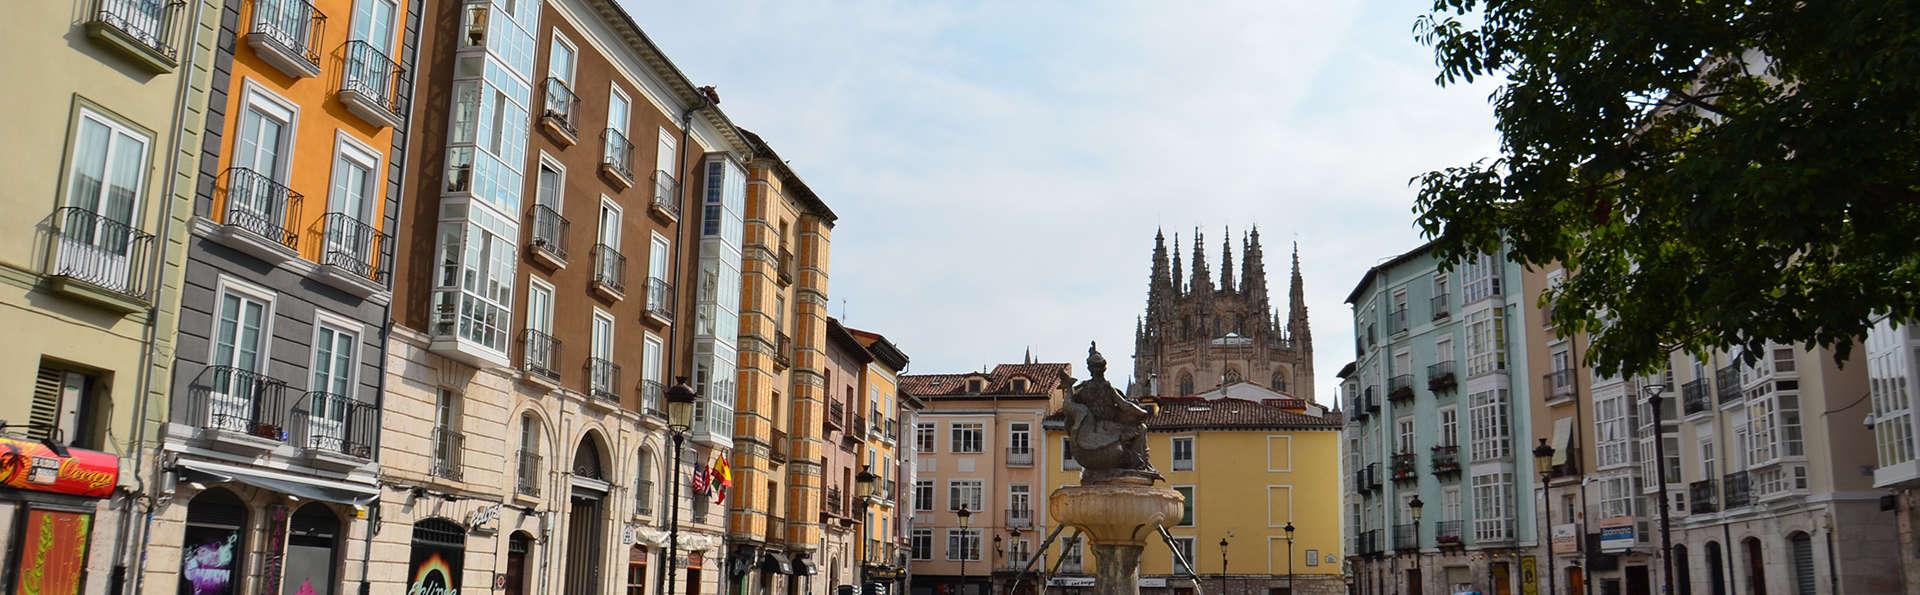 Hotel Puerta de Burgos - EDIT_destination.jpg